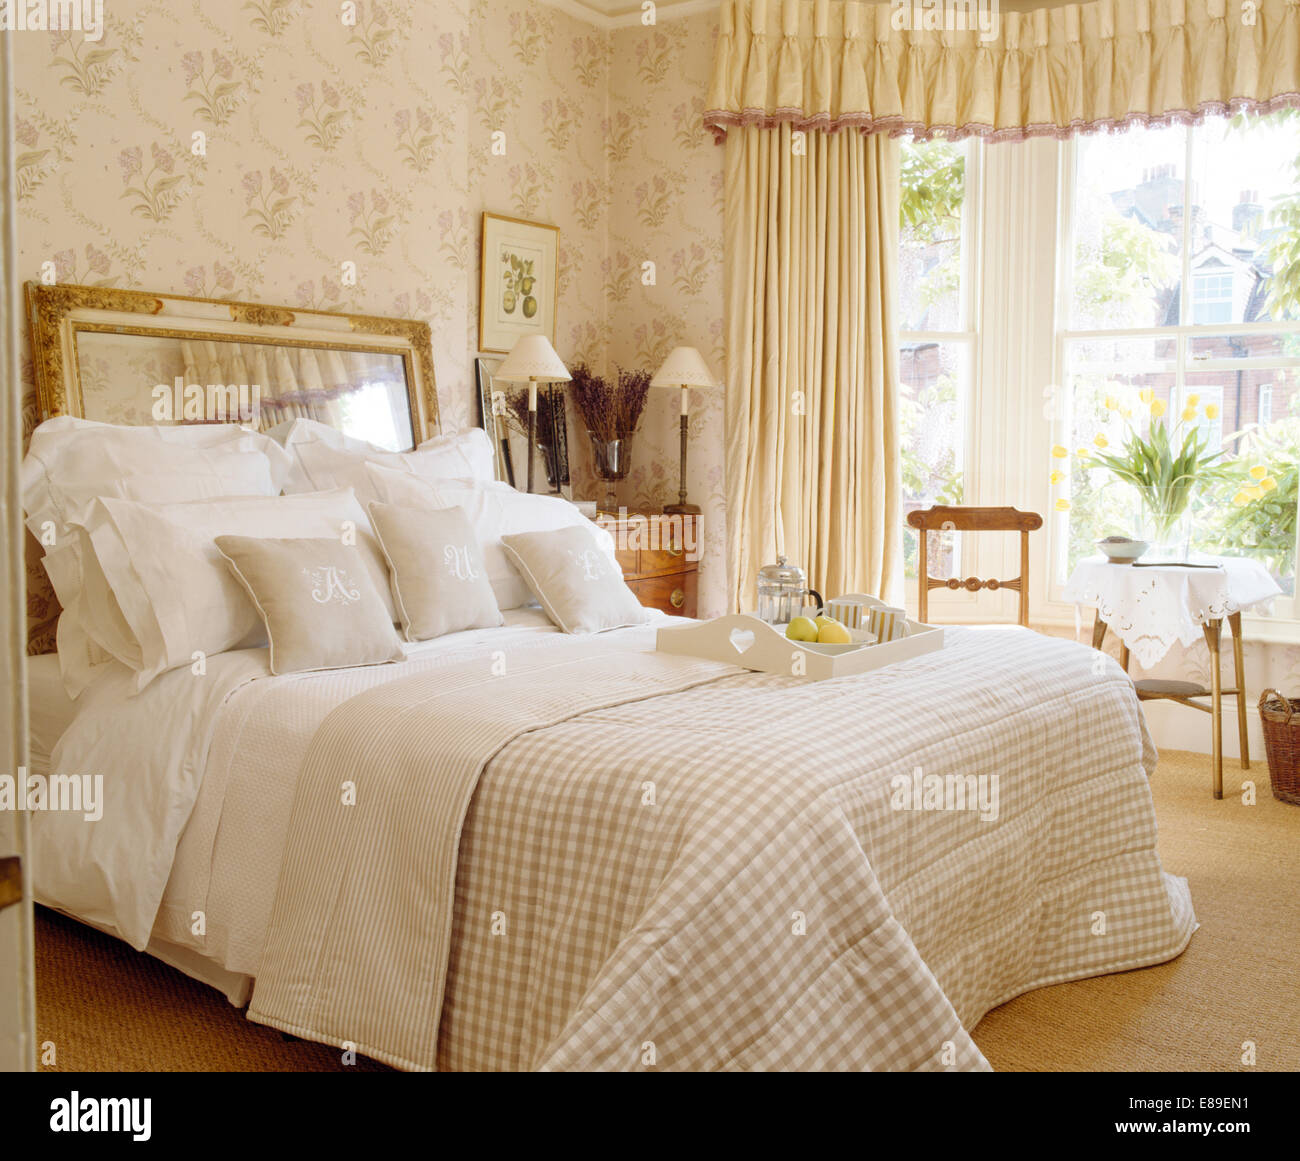 mirrors drapes soft furnishings stockfotos mirrors drapes soft furnishings bilder alamy. Black Bedroom Furniture Sets. Home Design Ideas